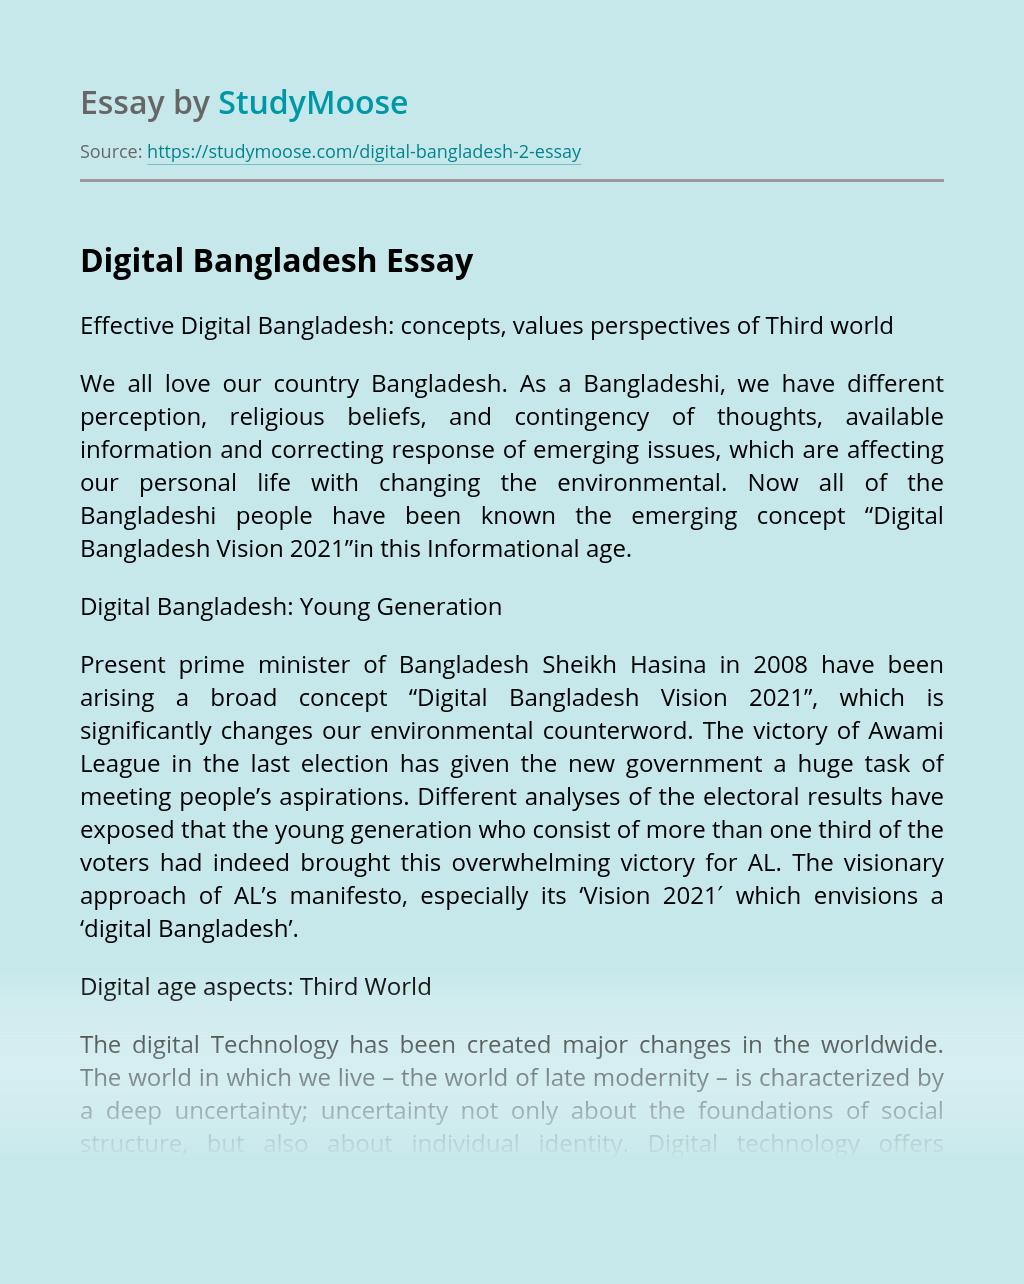 Digital Bangladesh